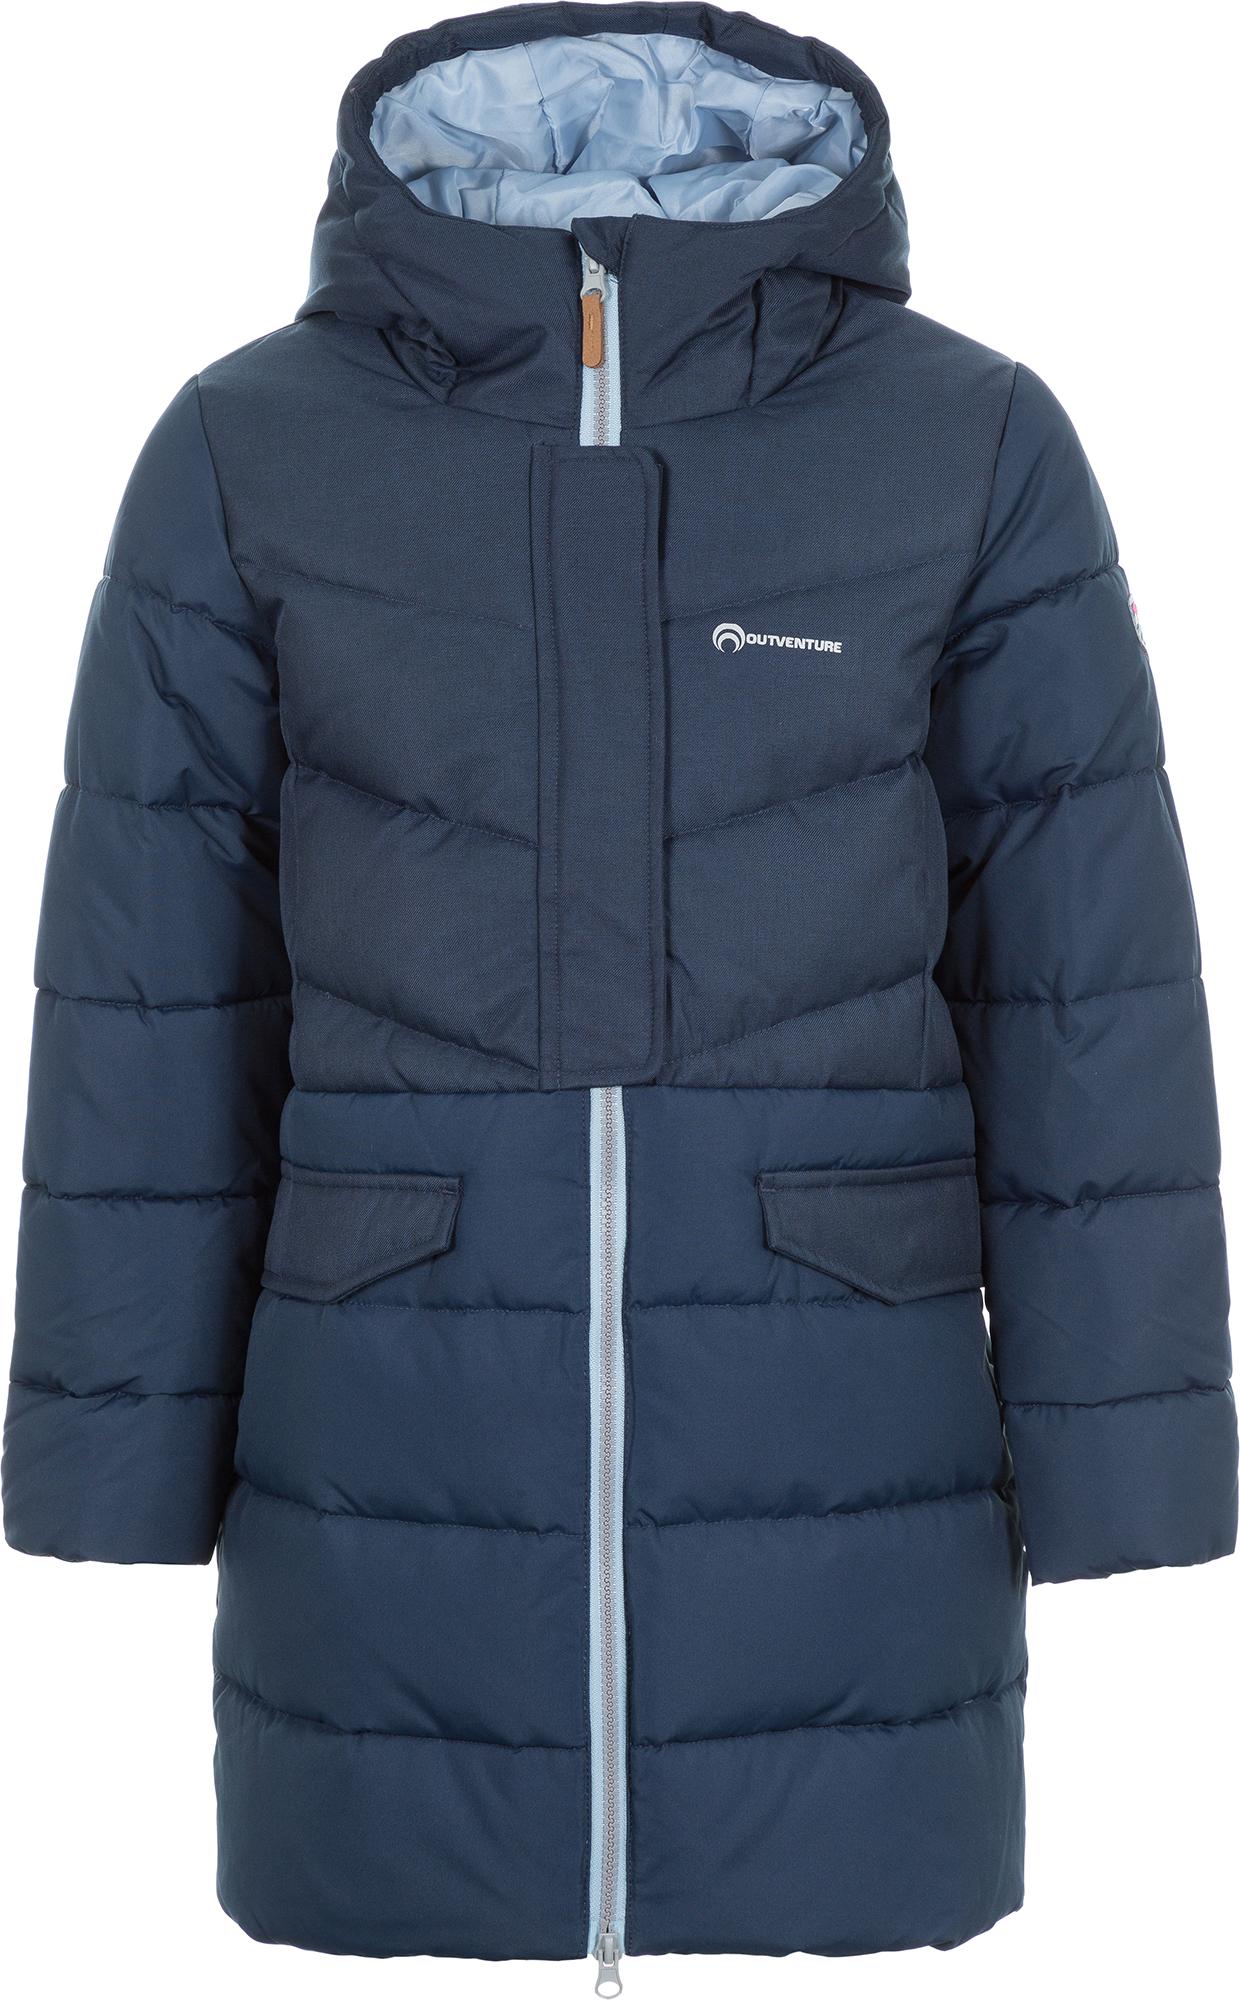 Outventure Куртка пуховая для девочек Outventure, размер 152